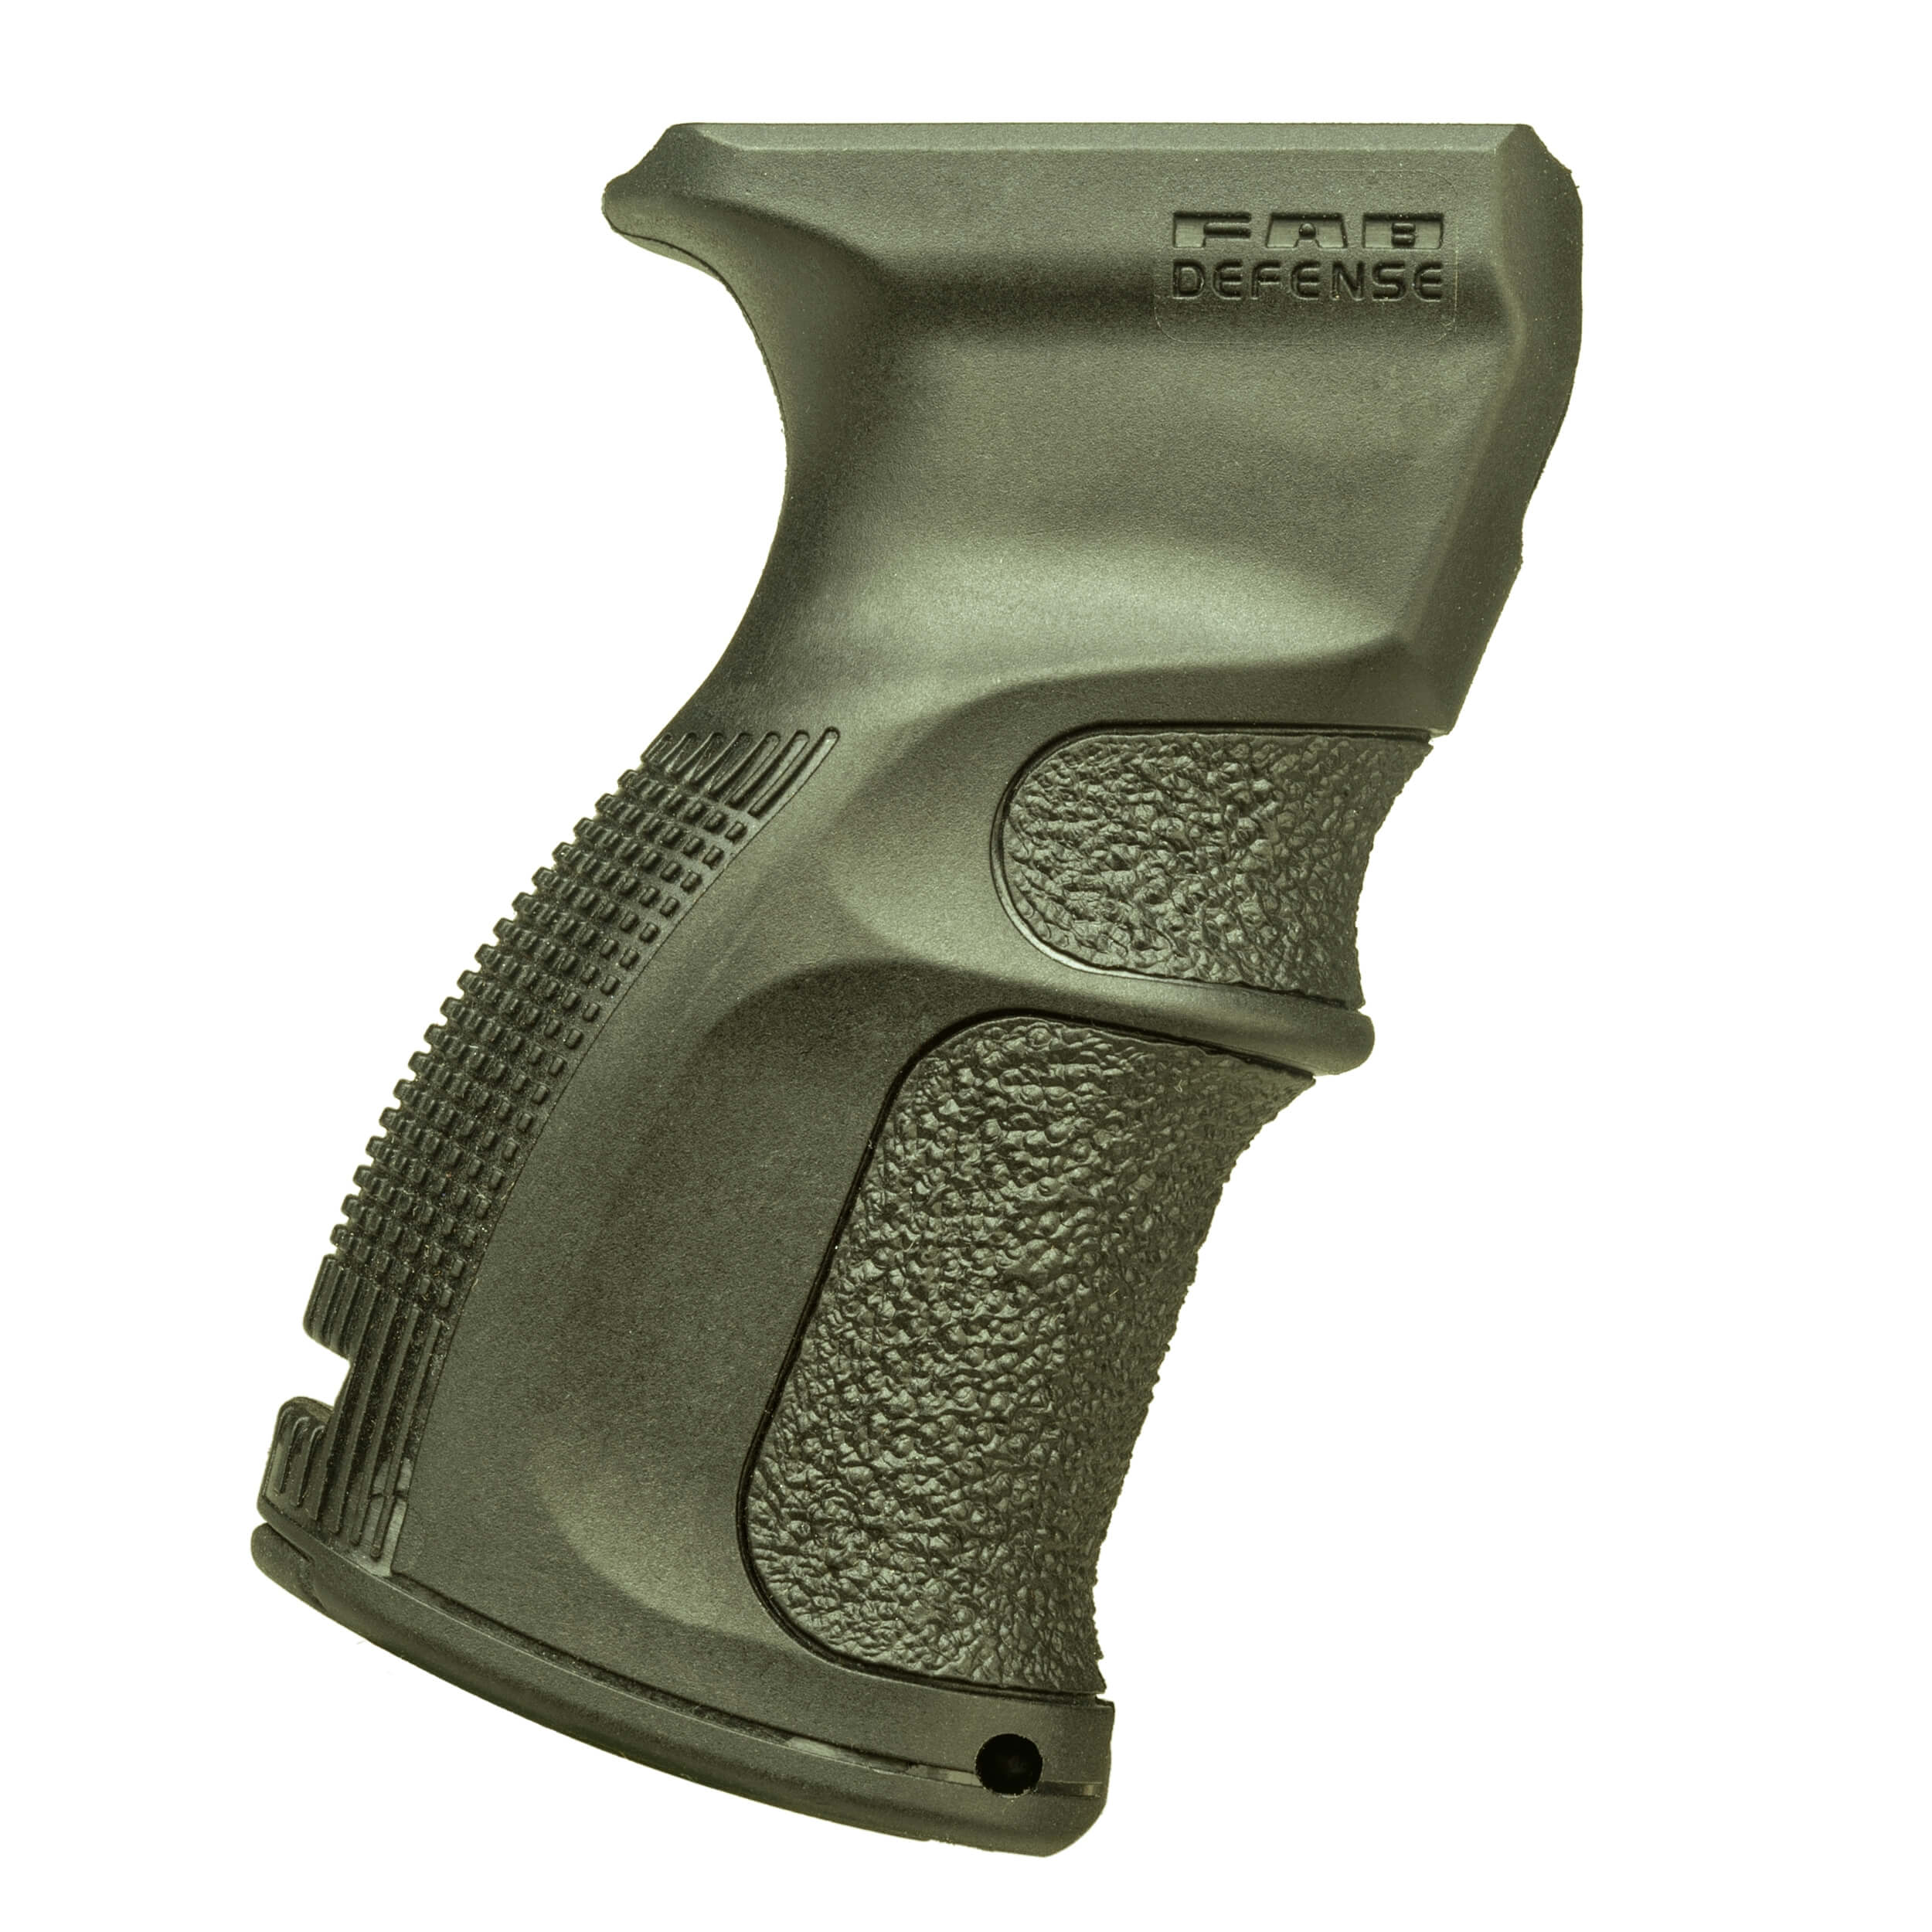 AG-FAL Pistol Grip für FN FAL